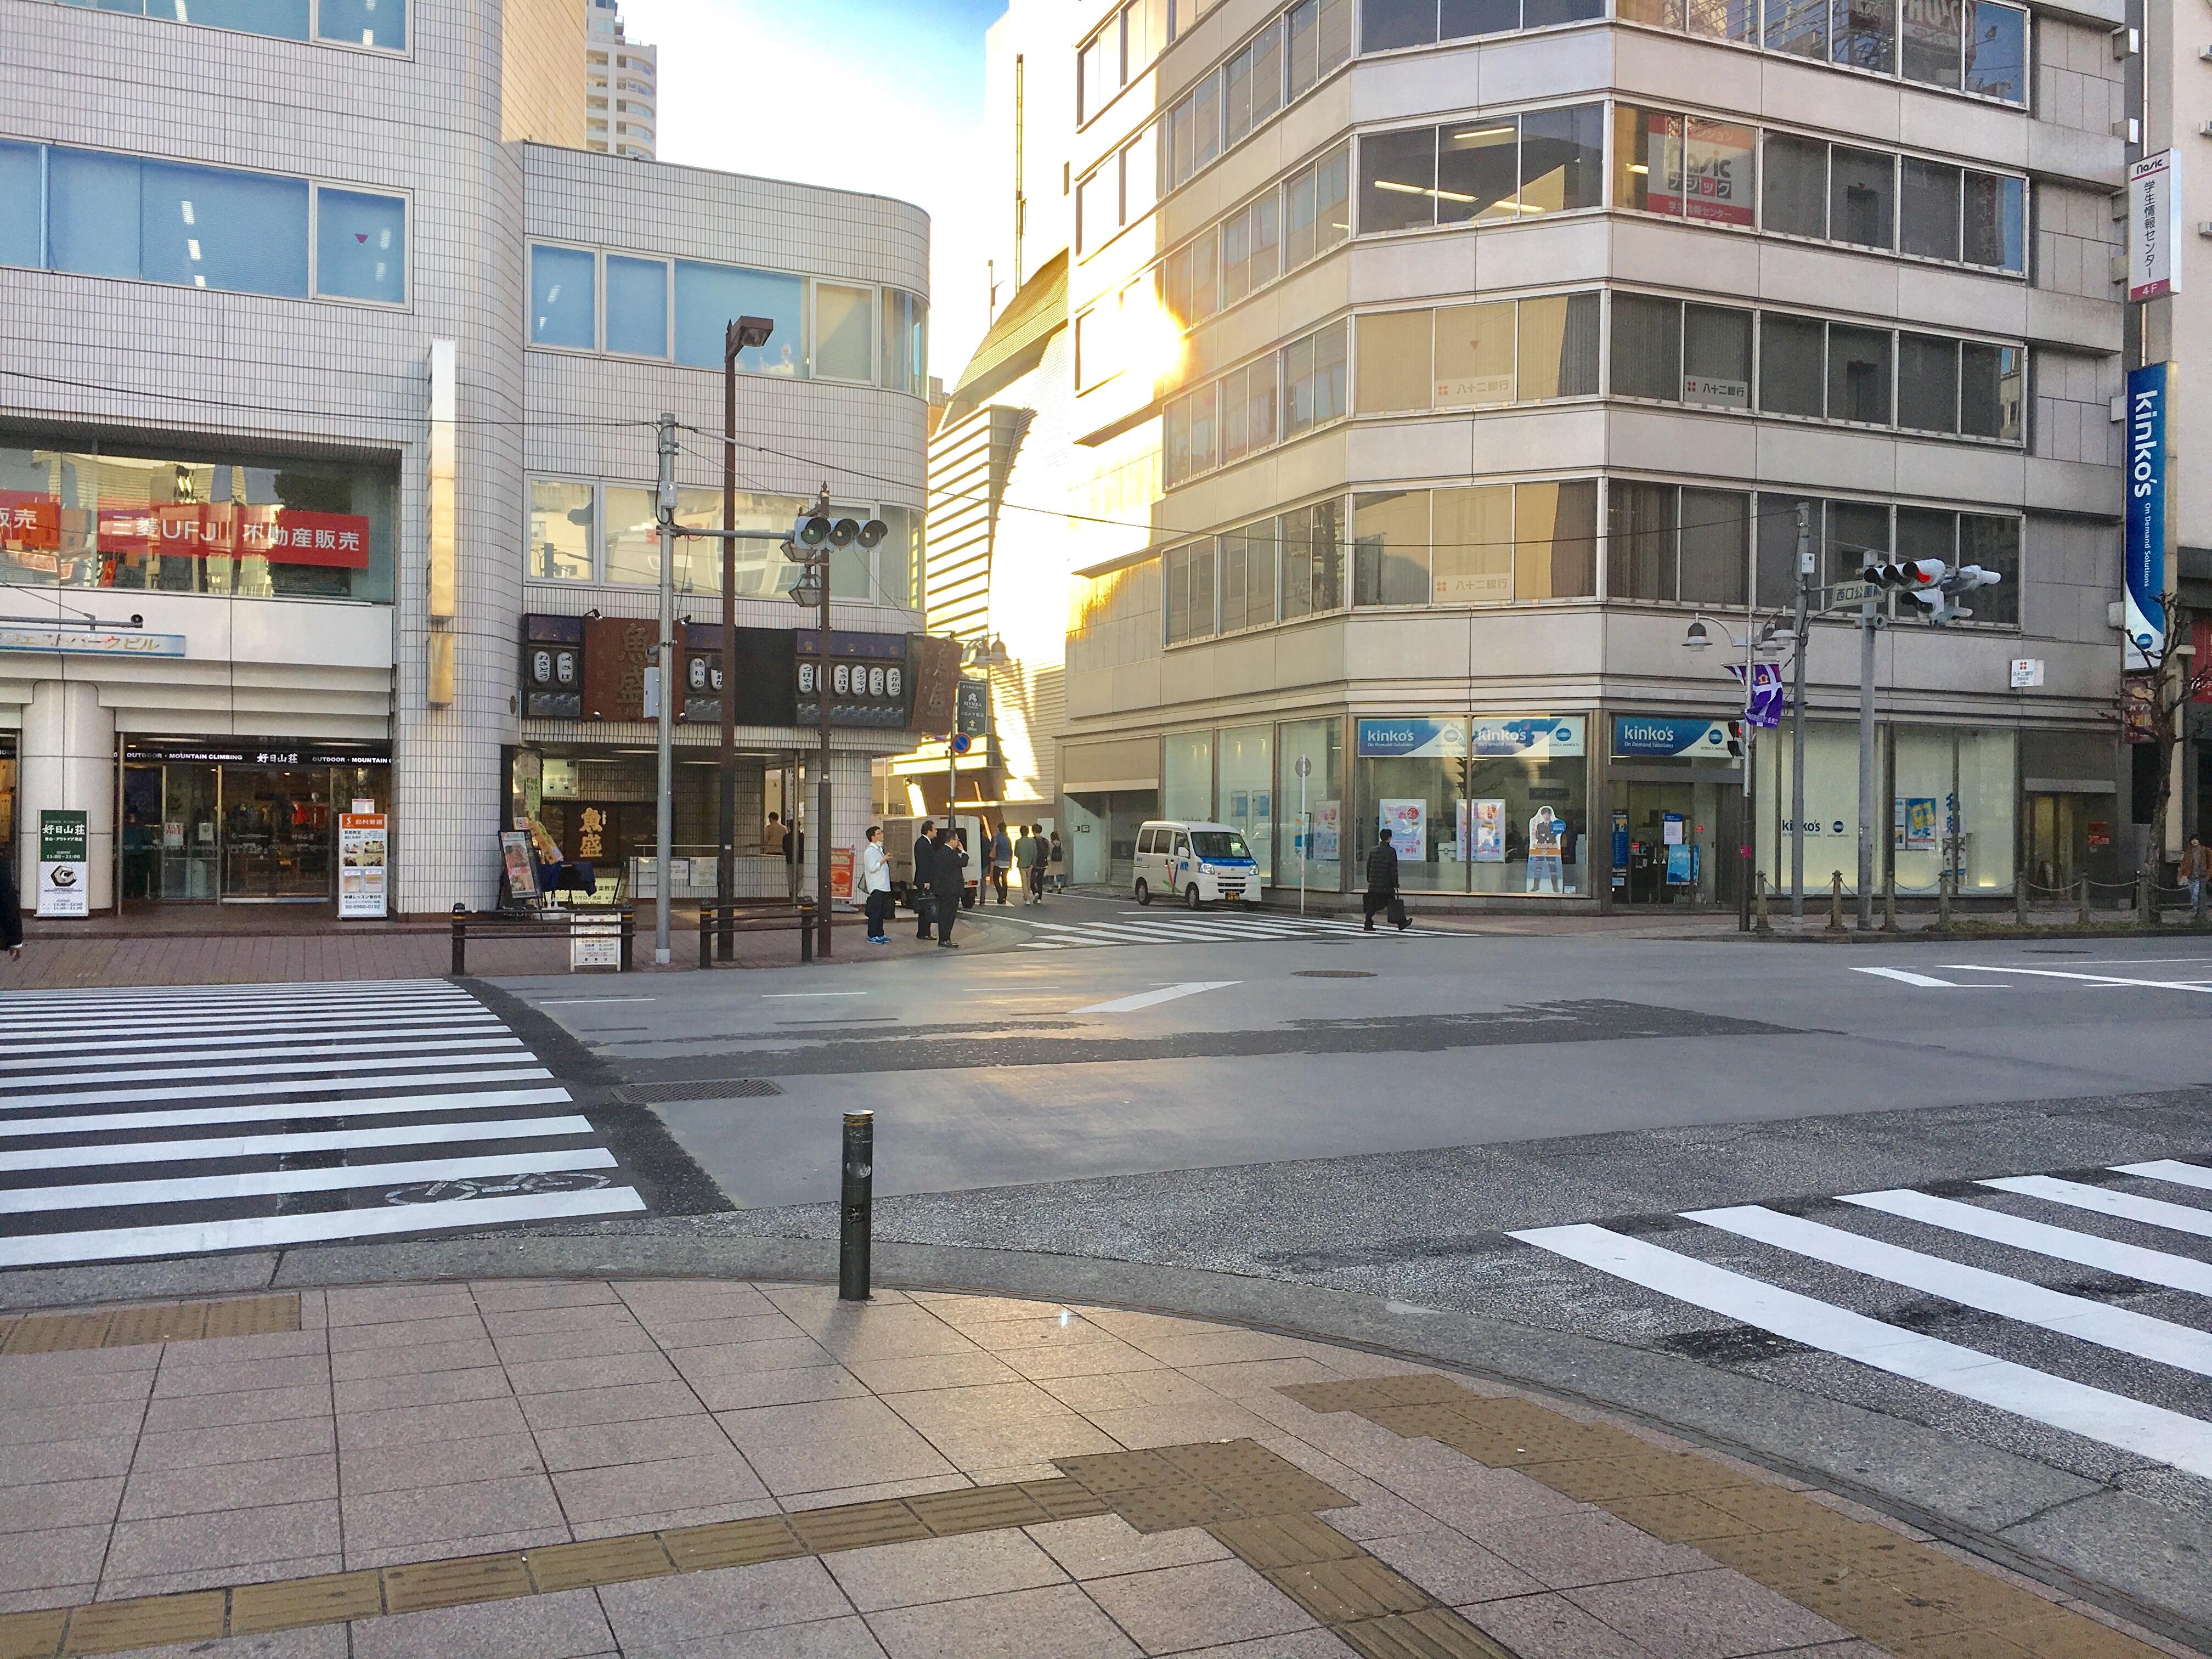 f:id:SoichiroIkeshita:20170407233759j:image